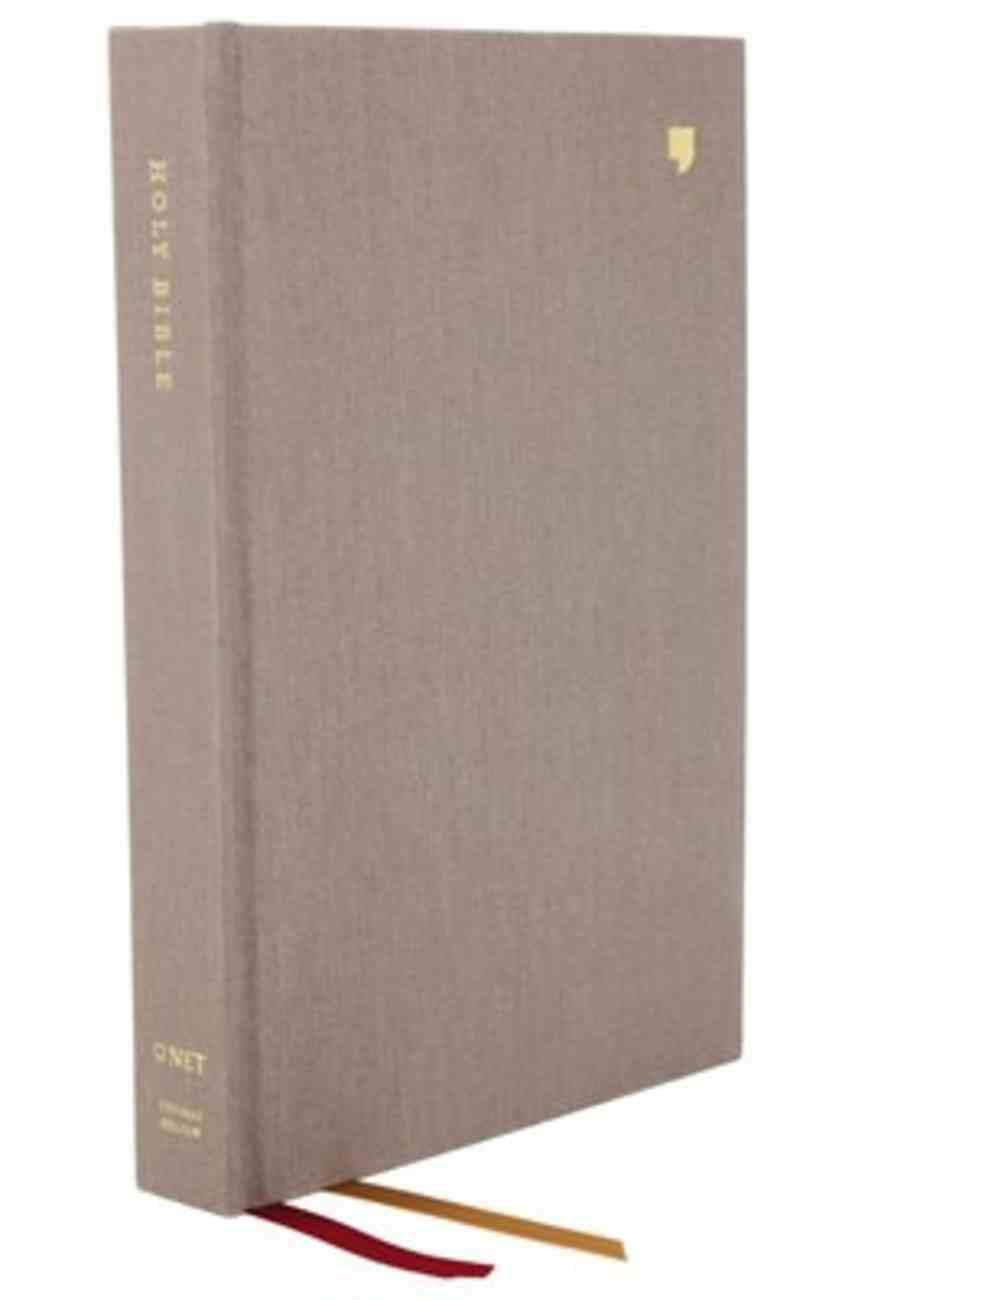 NET Bible Thinline Large Print Gray Fabric Over Hardback